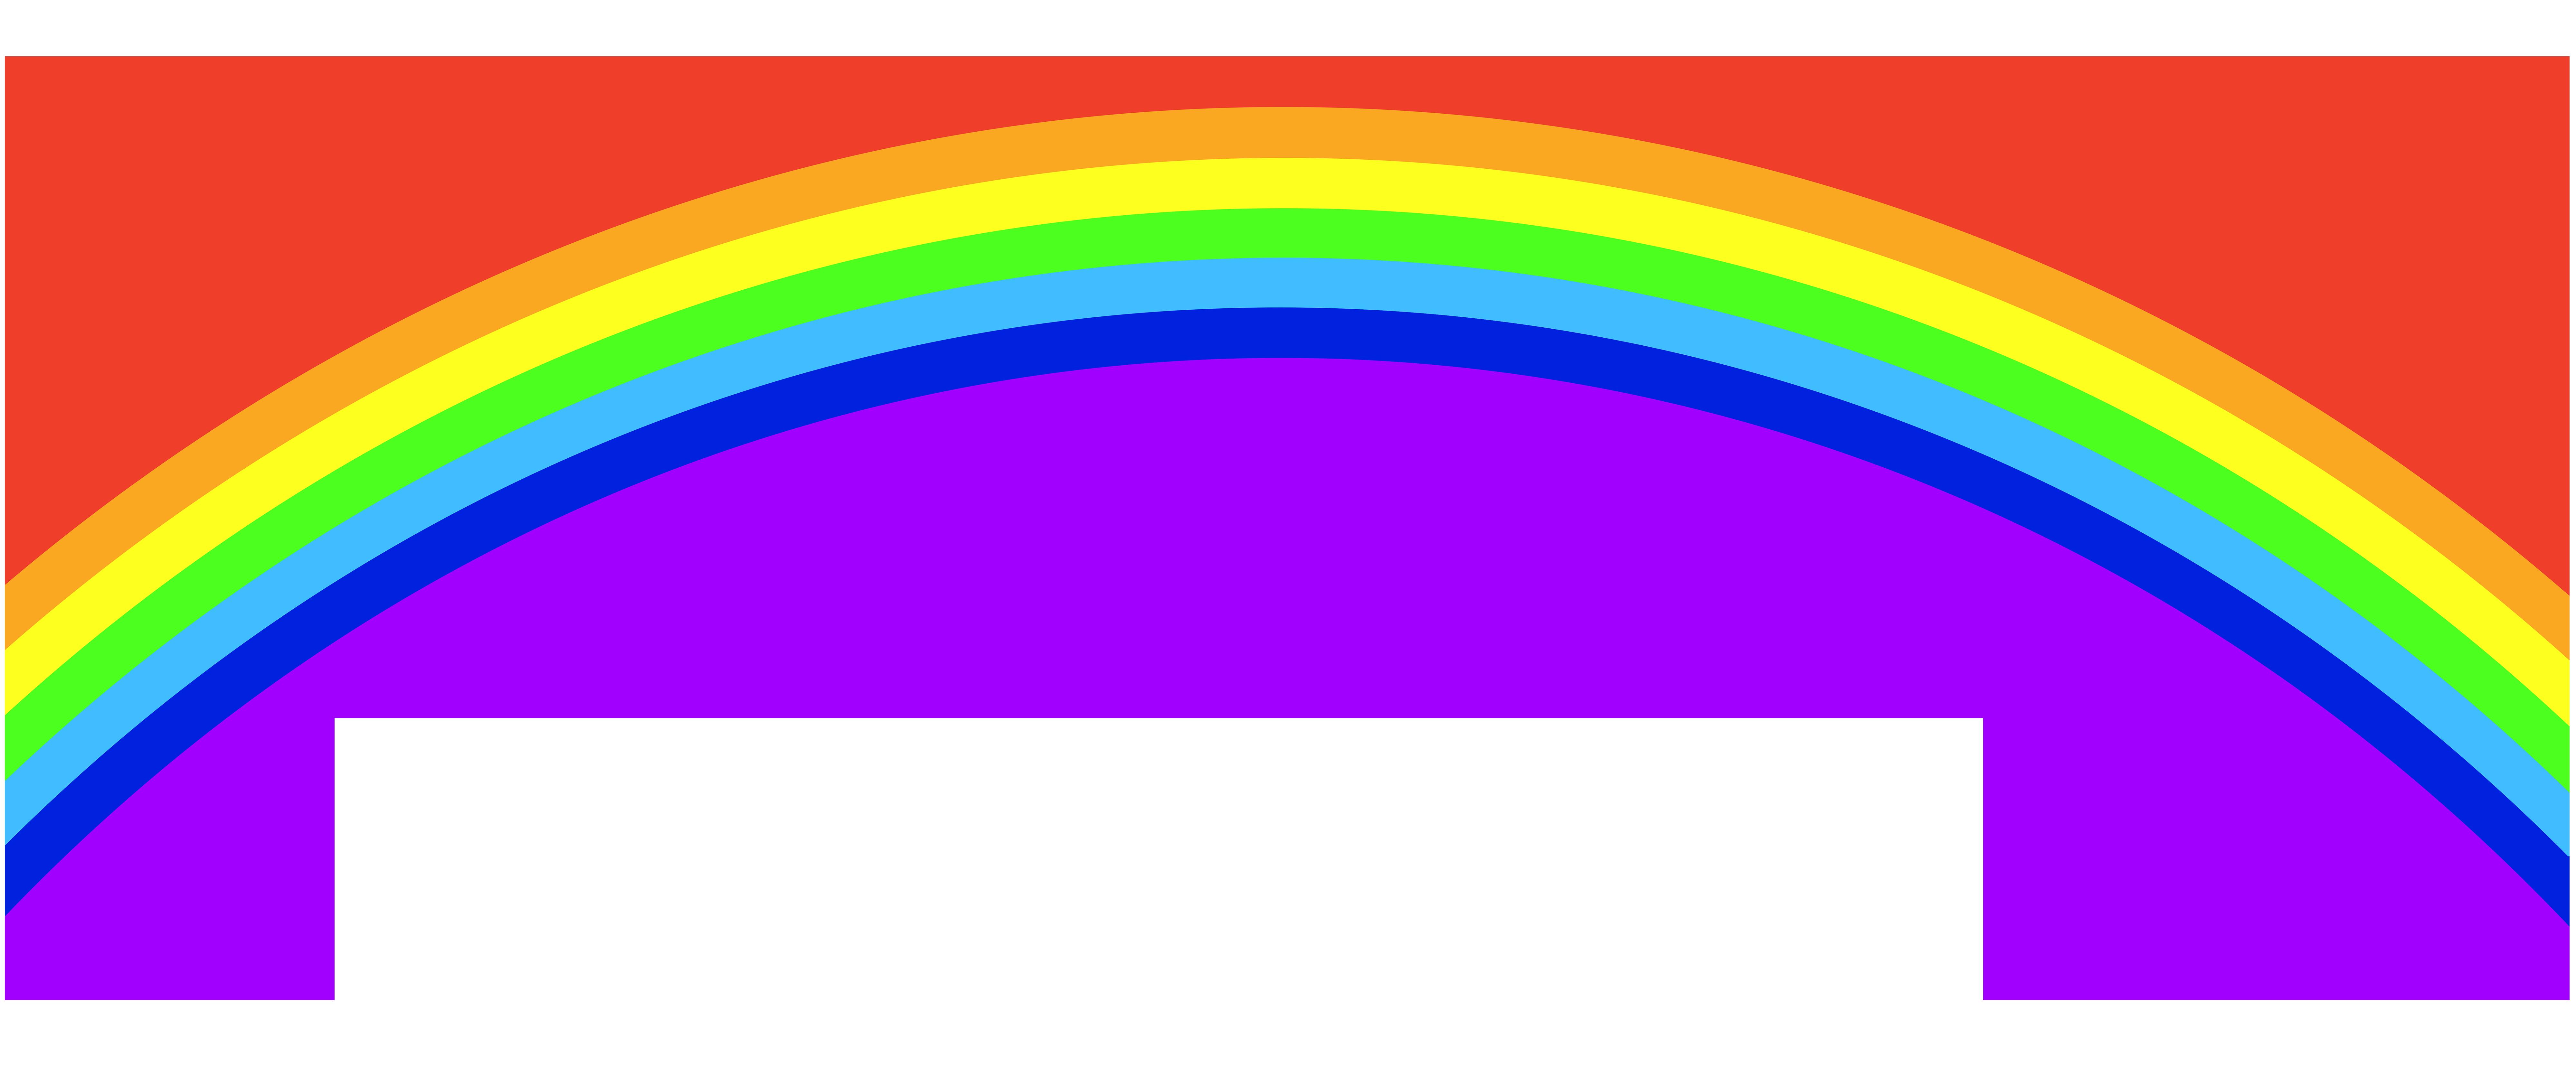 8000x3315 Rainbow Clip Art PNG Imageu200b Gallery Yopriceville